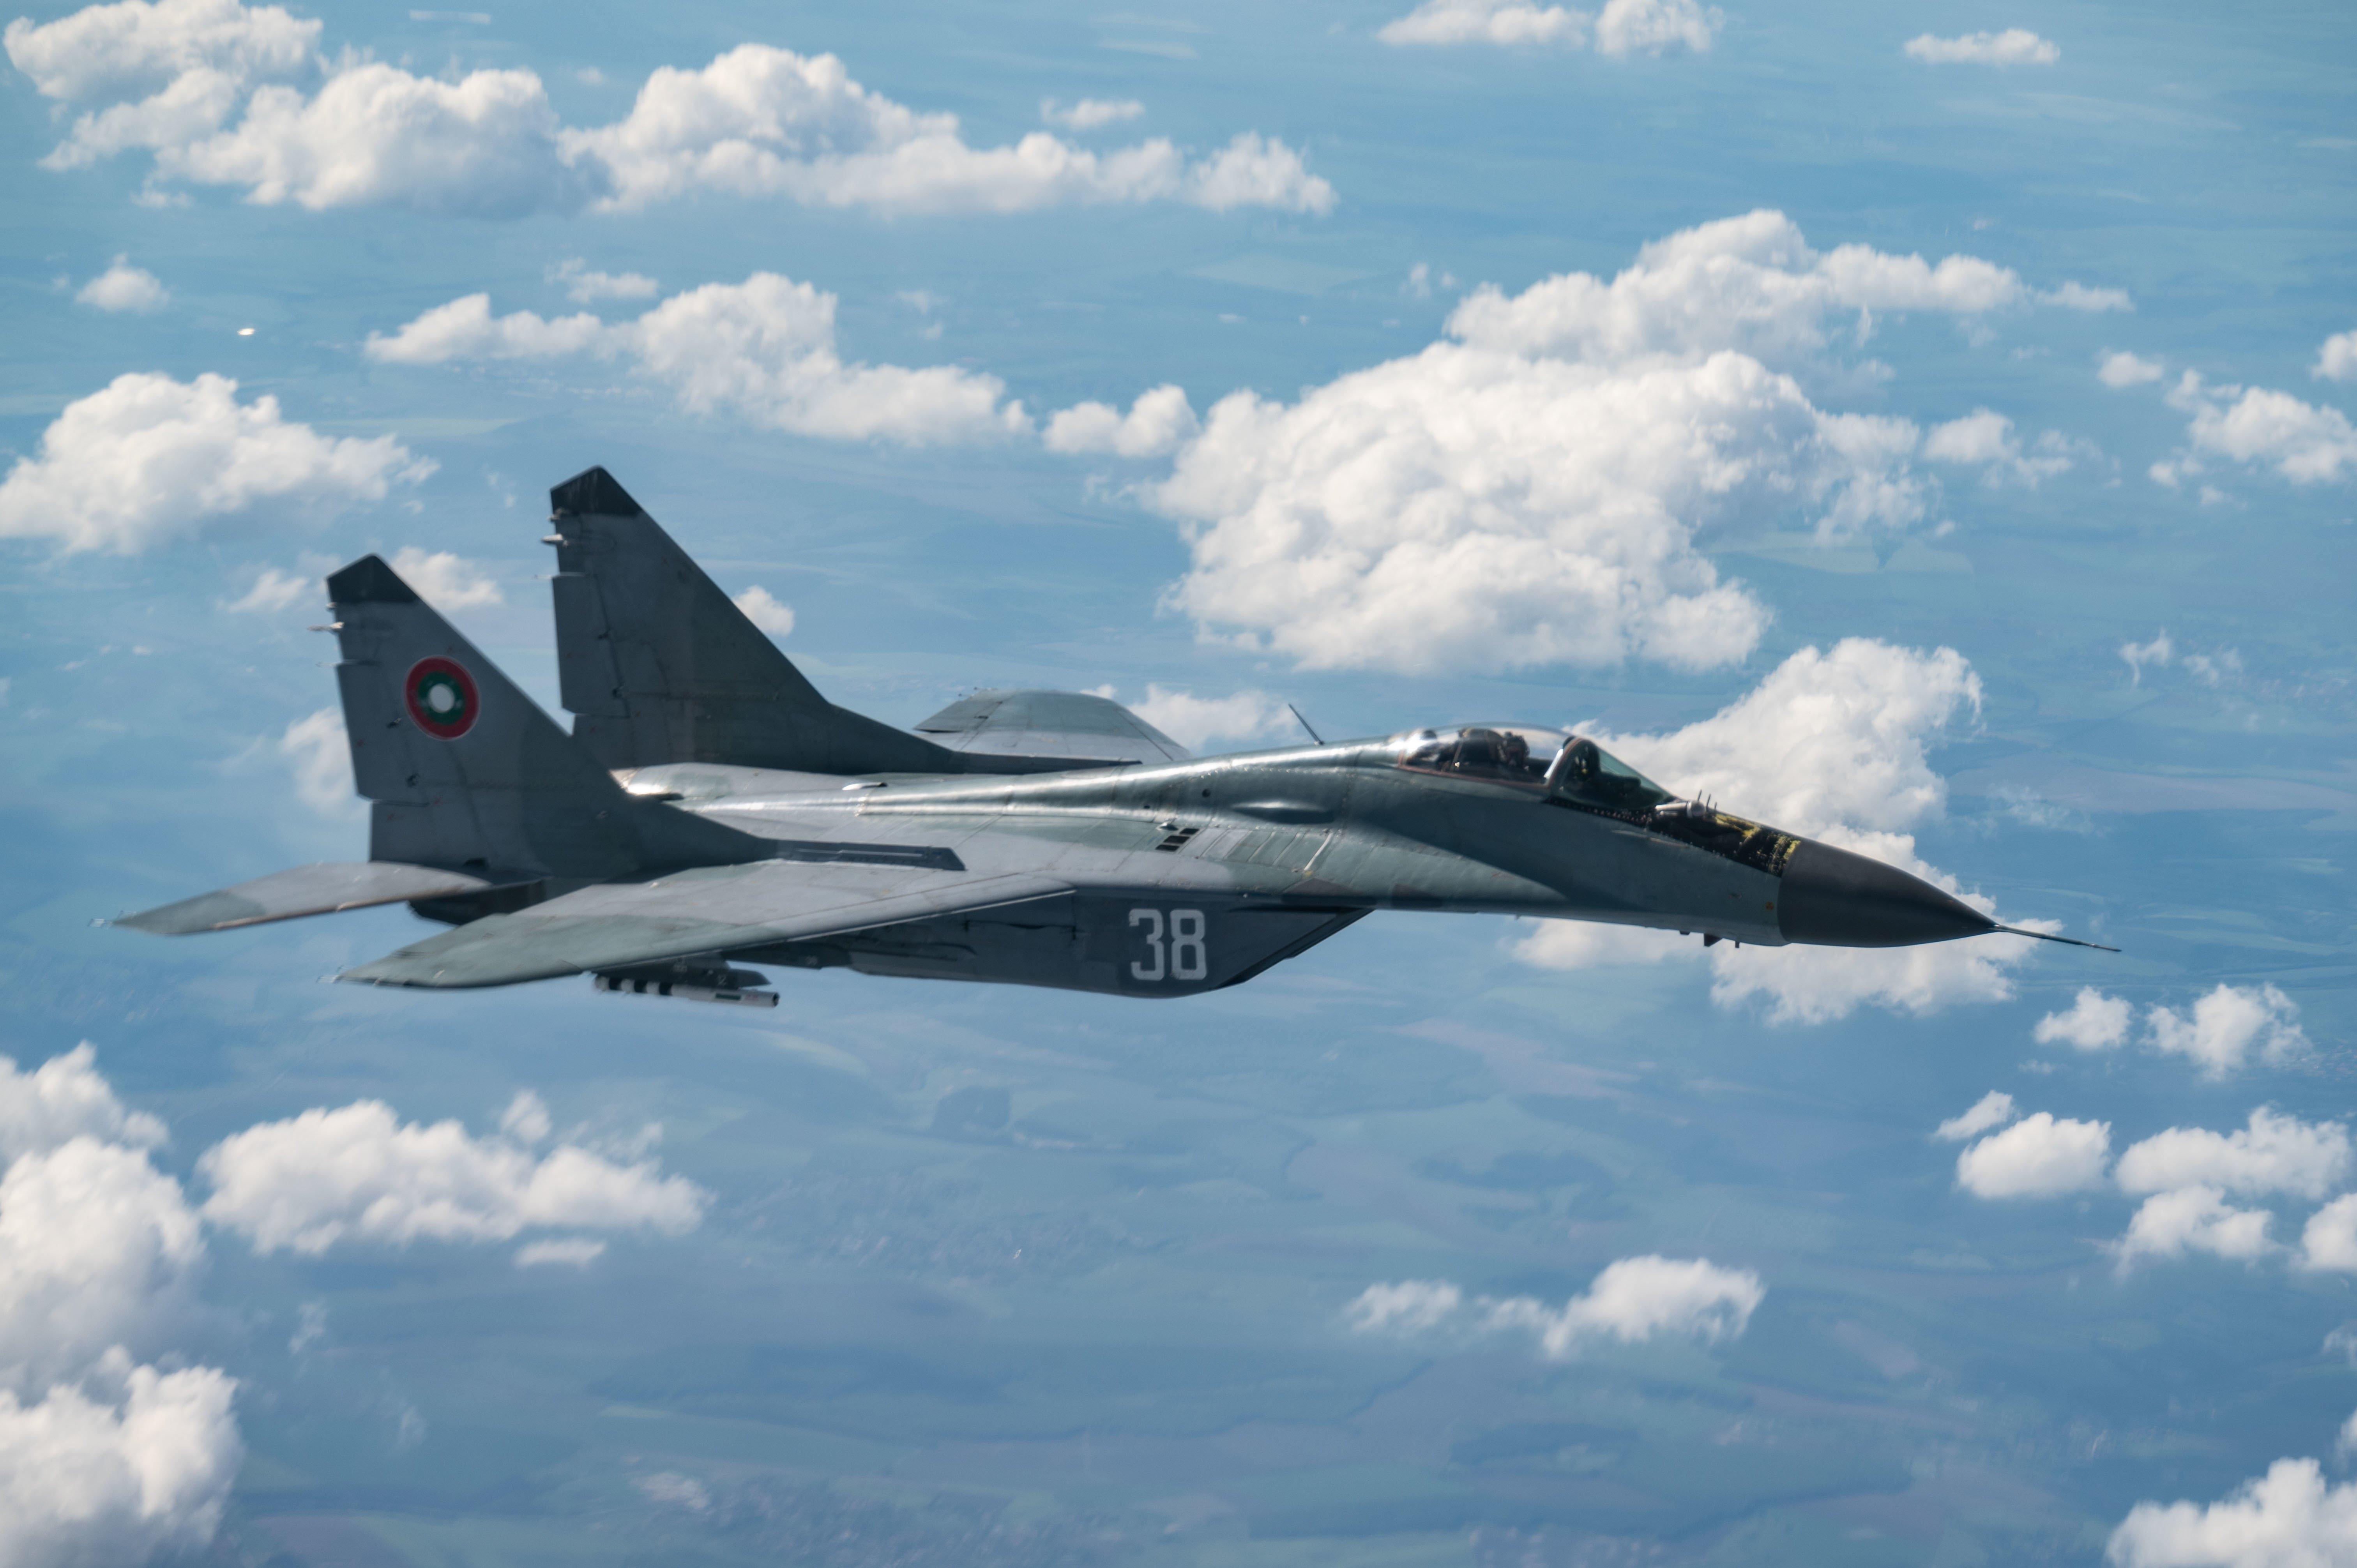 Bulgarian MiG-29 [USAF/Senior Airman Daniel Hernandez]